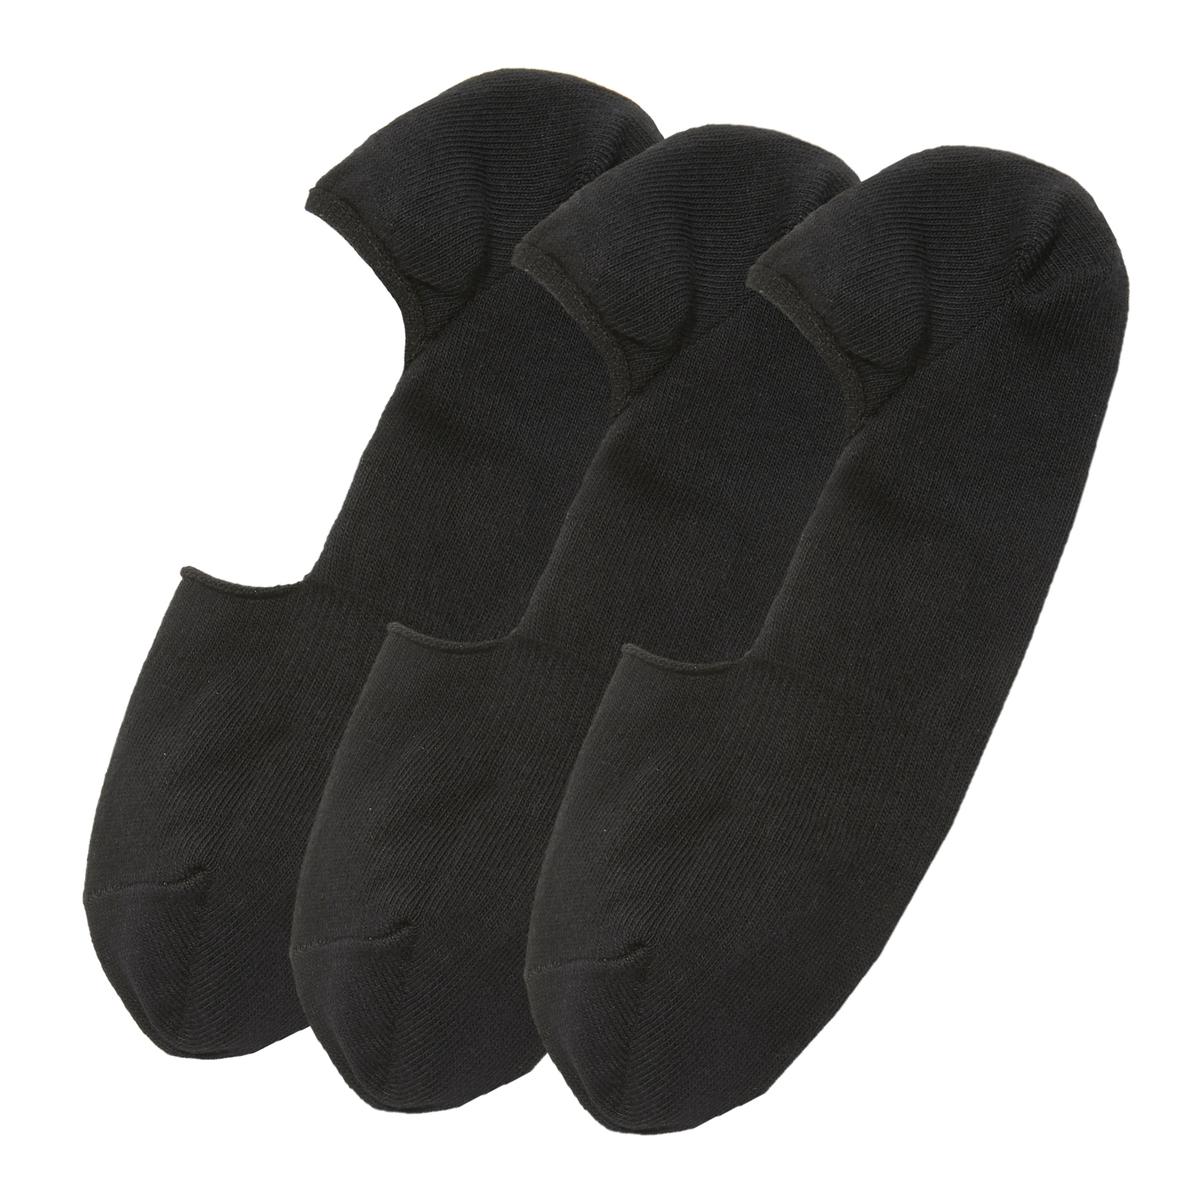 Lote de 3 pares de calcetines invisibles